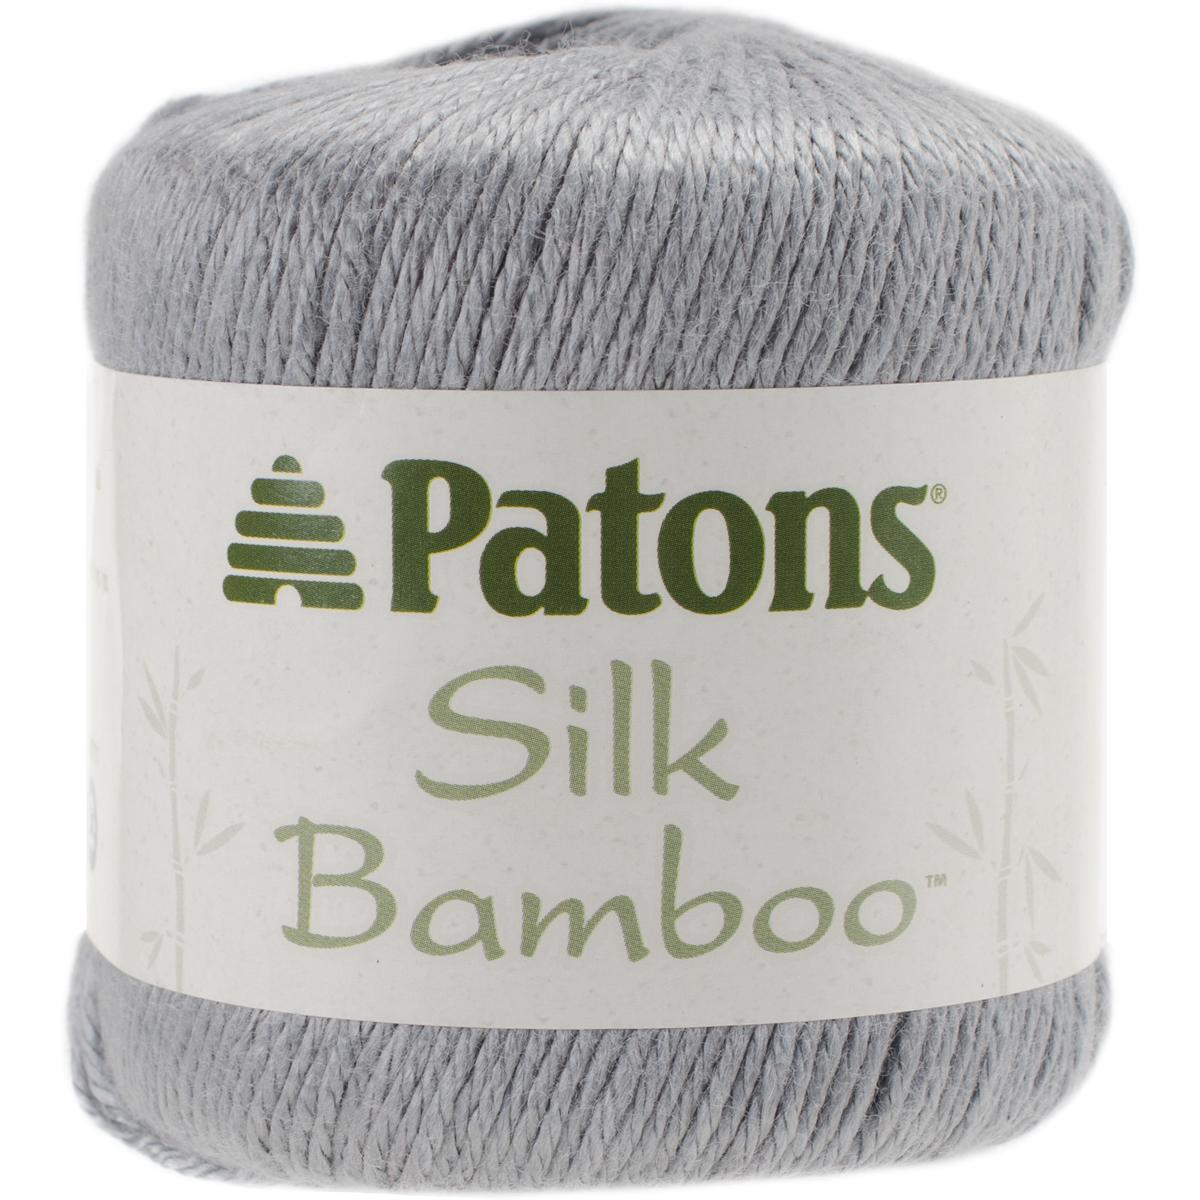 Patons Silk Bamboo Yarn-Ivory